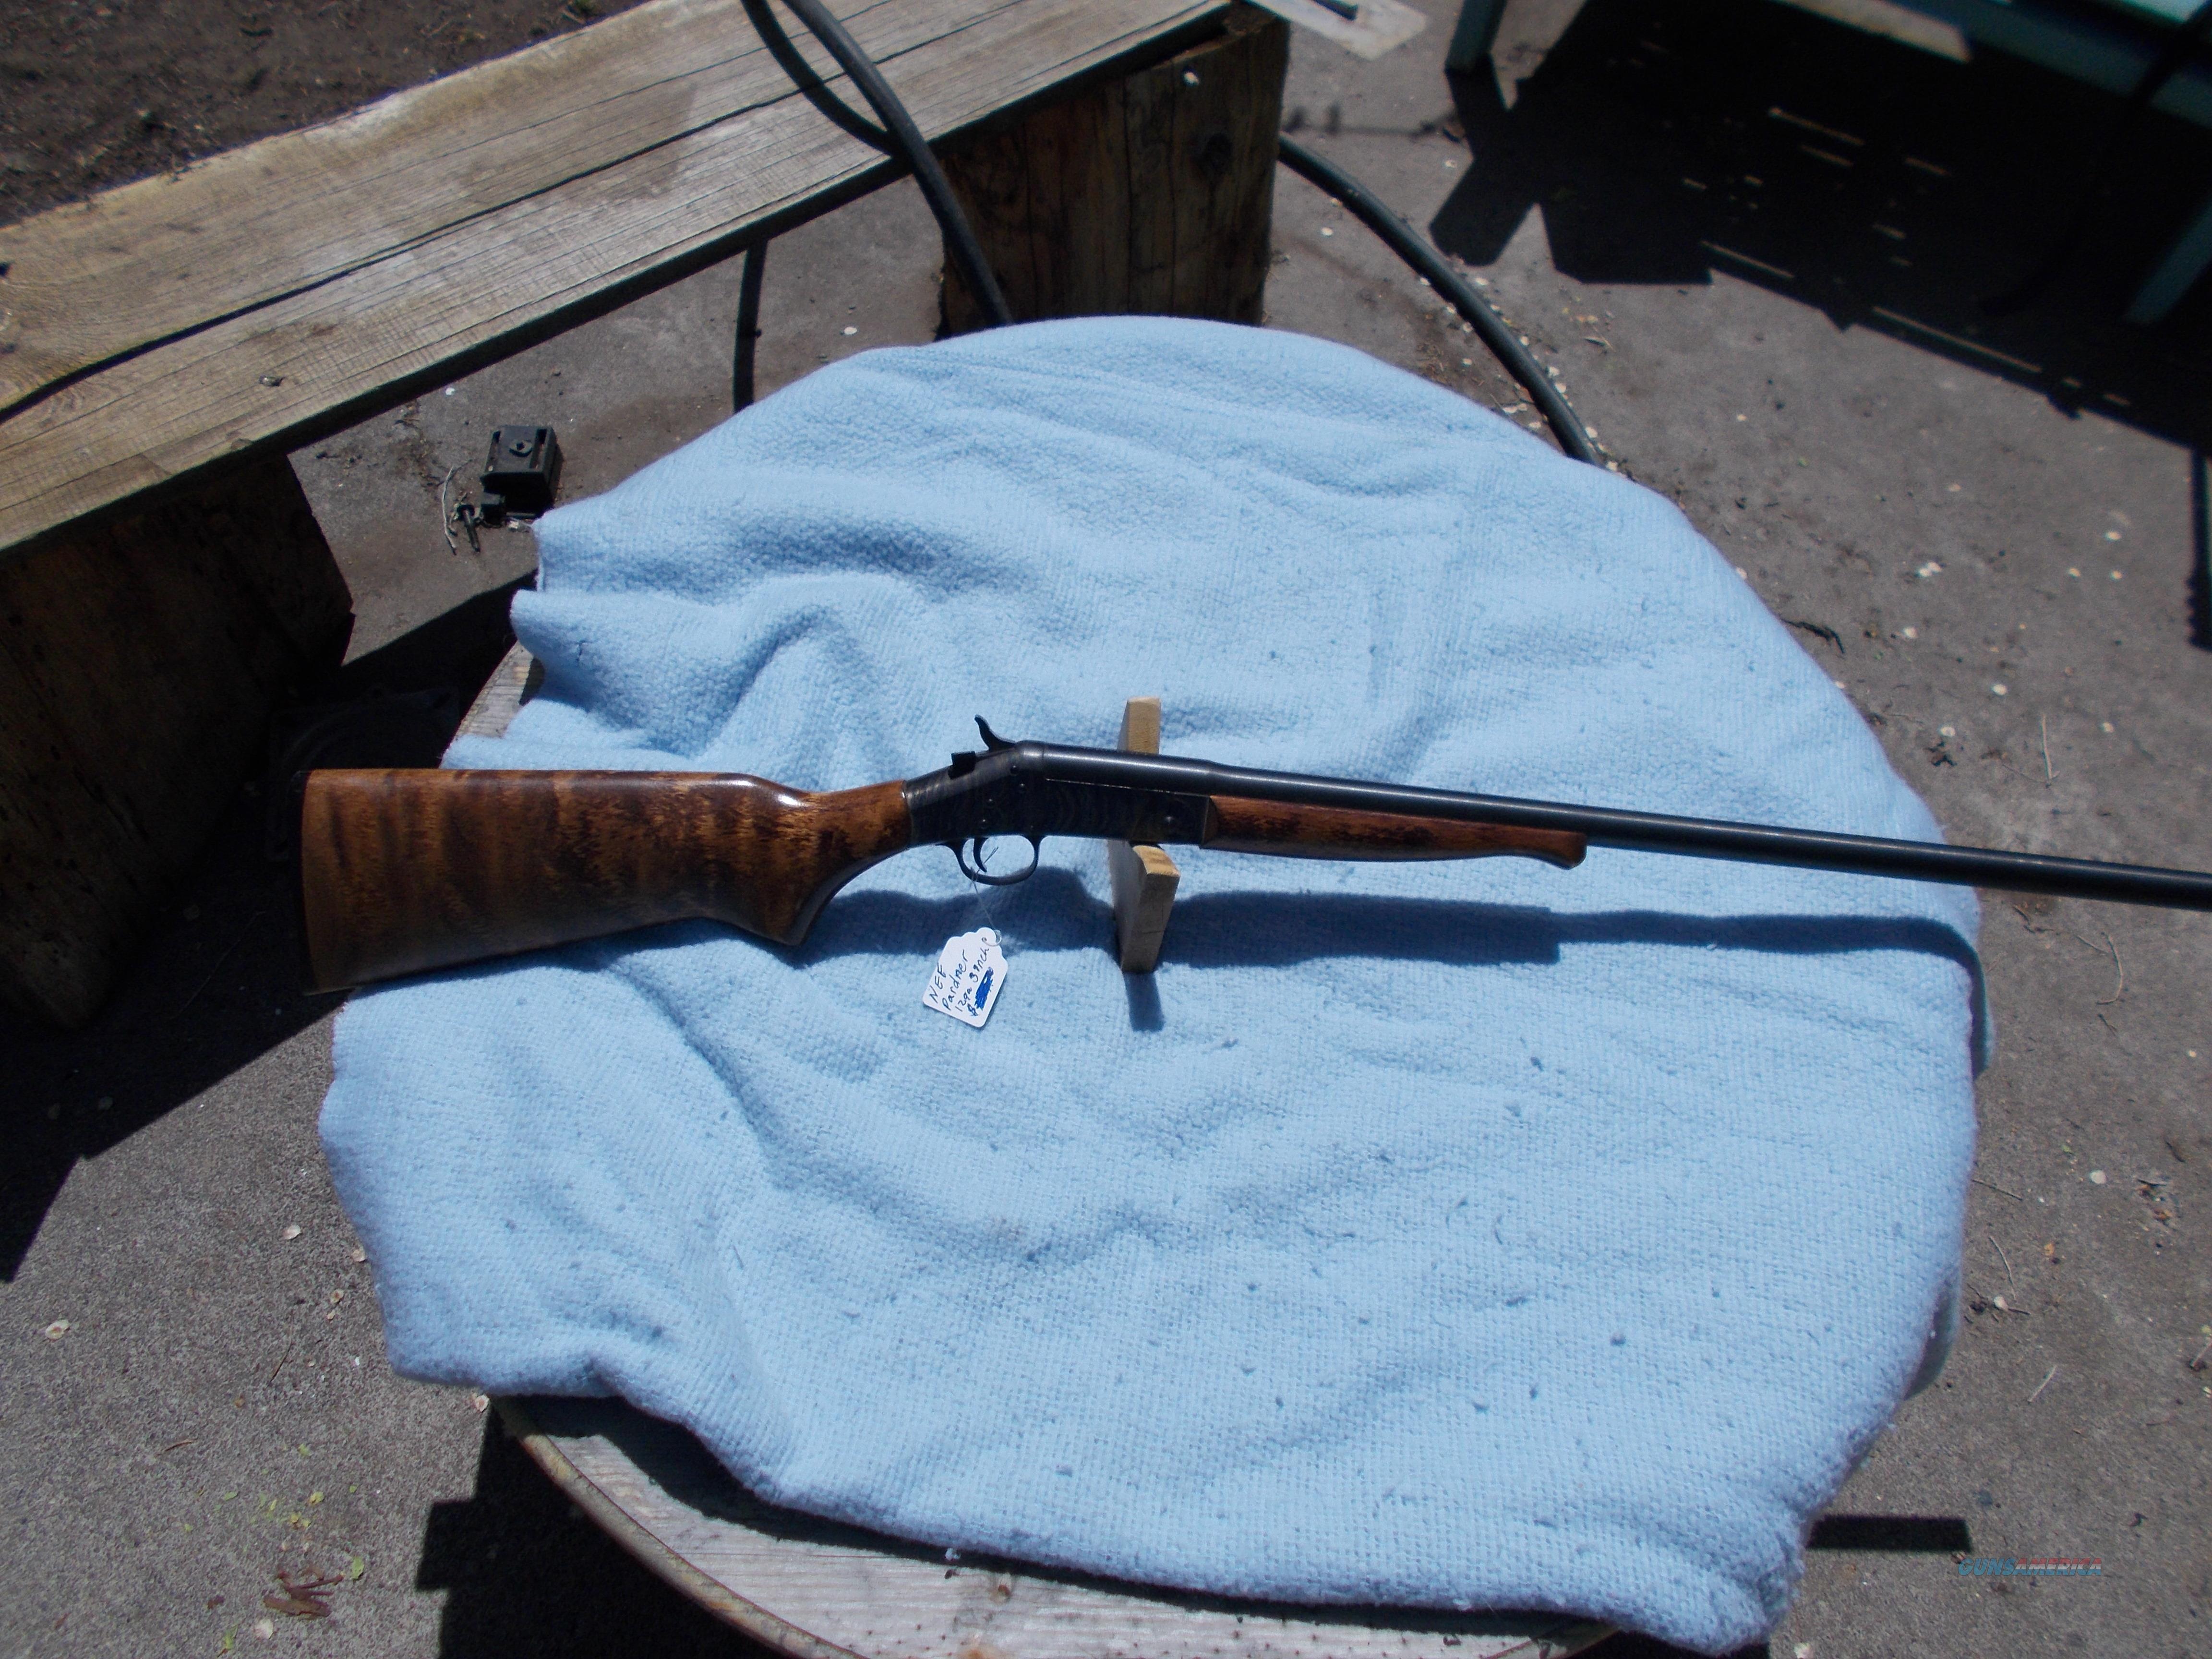 NEF sb1 12 ga 3 inch  Guns > Shotguns > New England Firearms (NEF) Shotguns